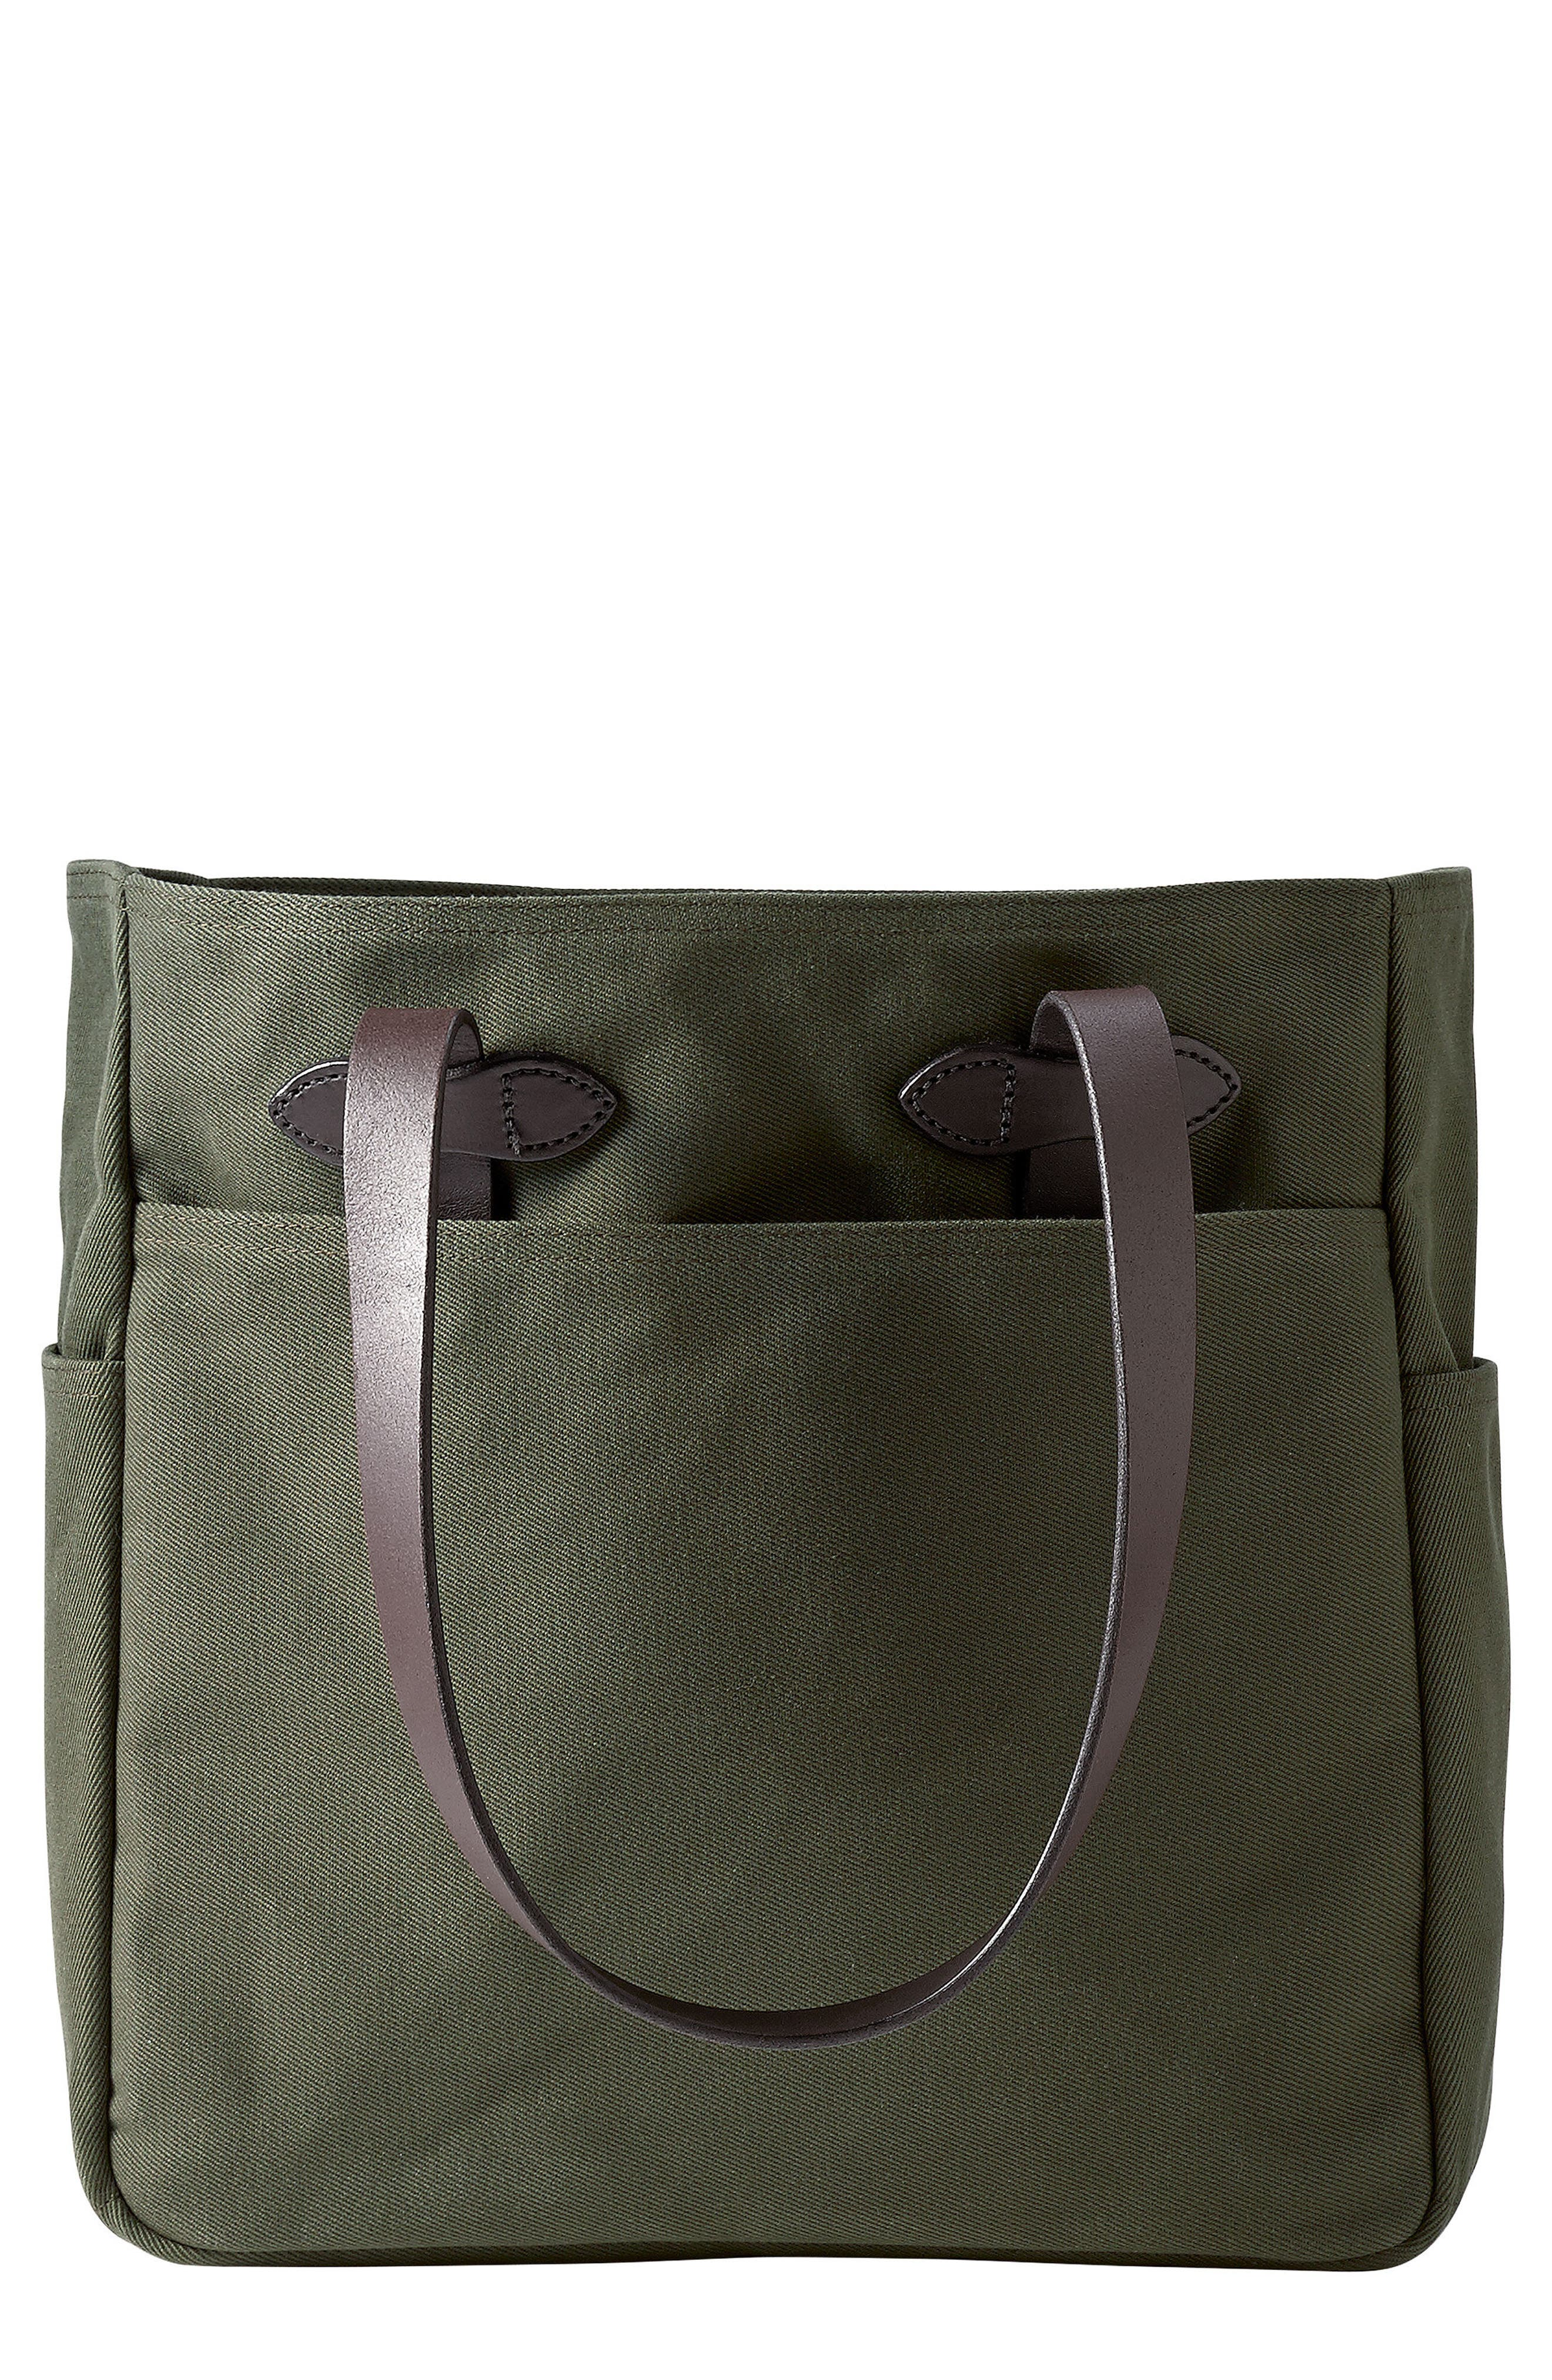 Rugged Twill Tote Bag